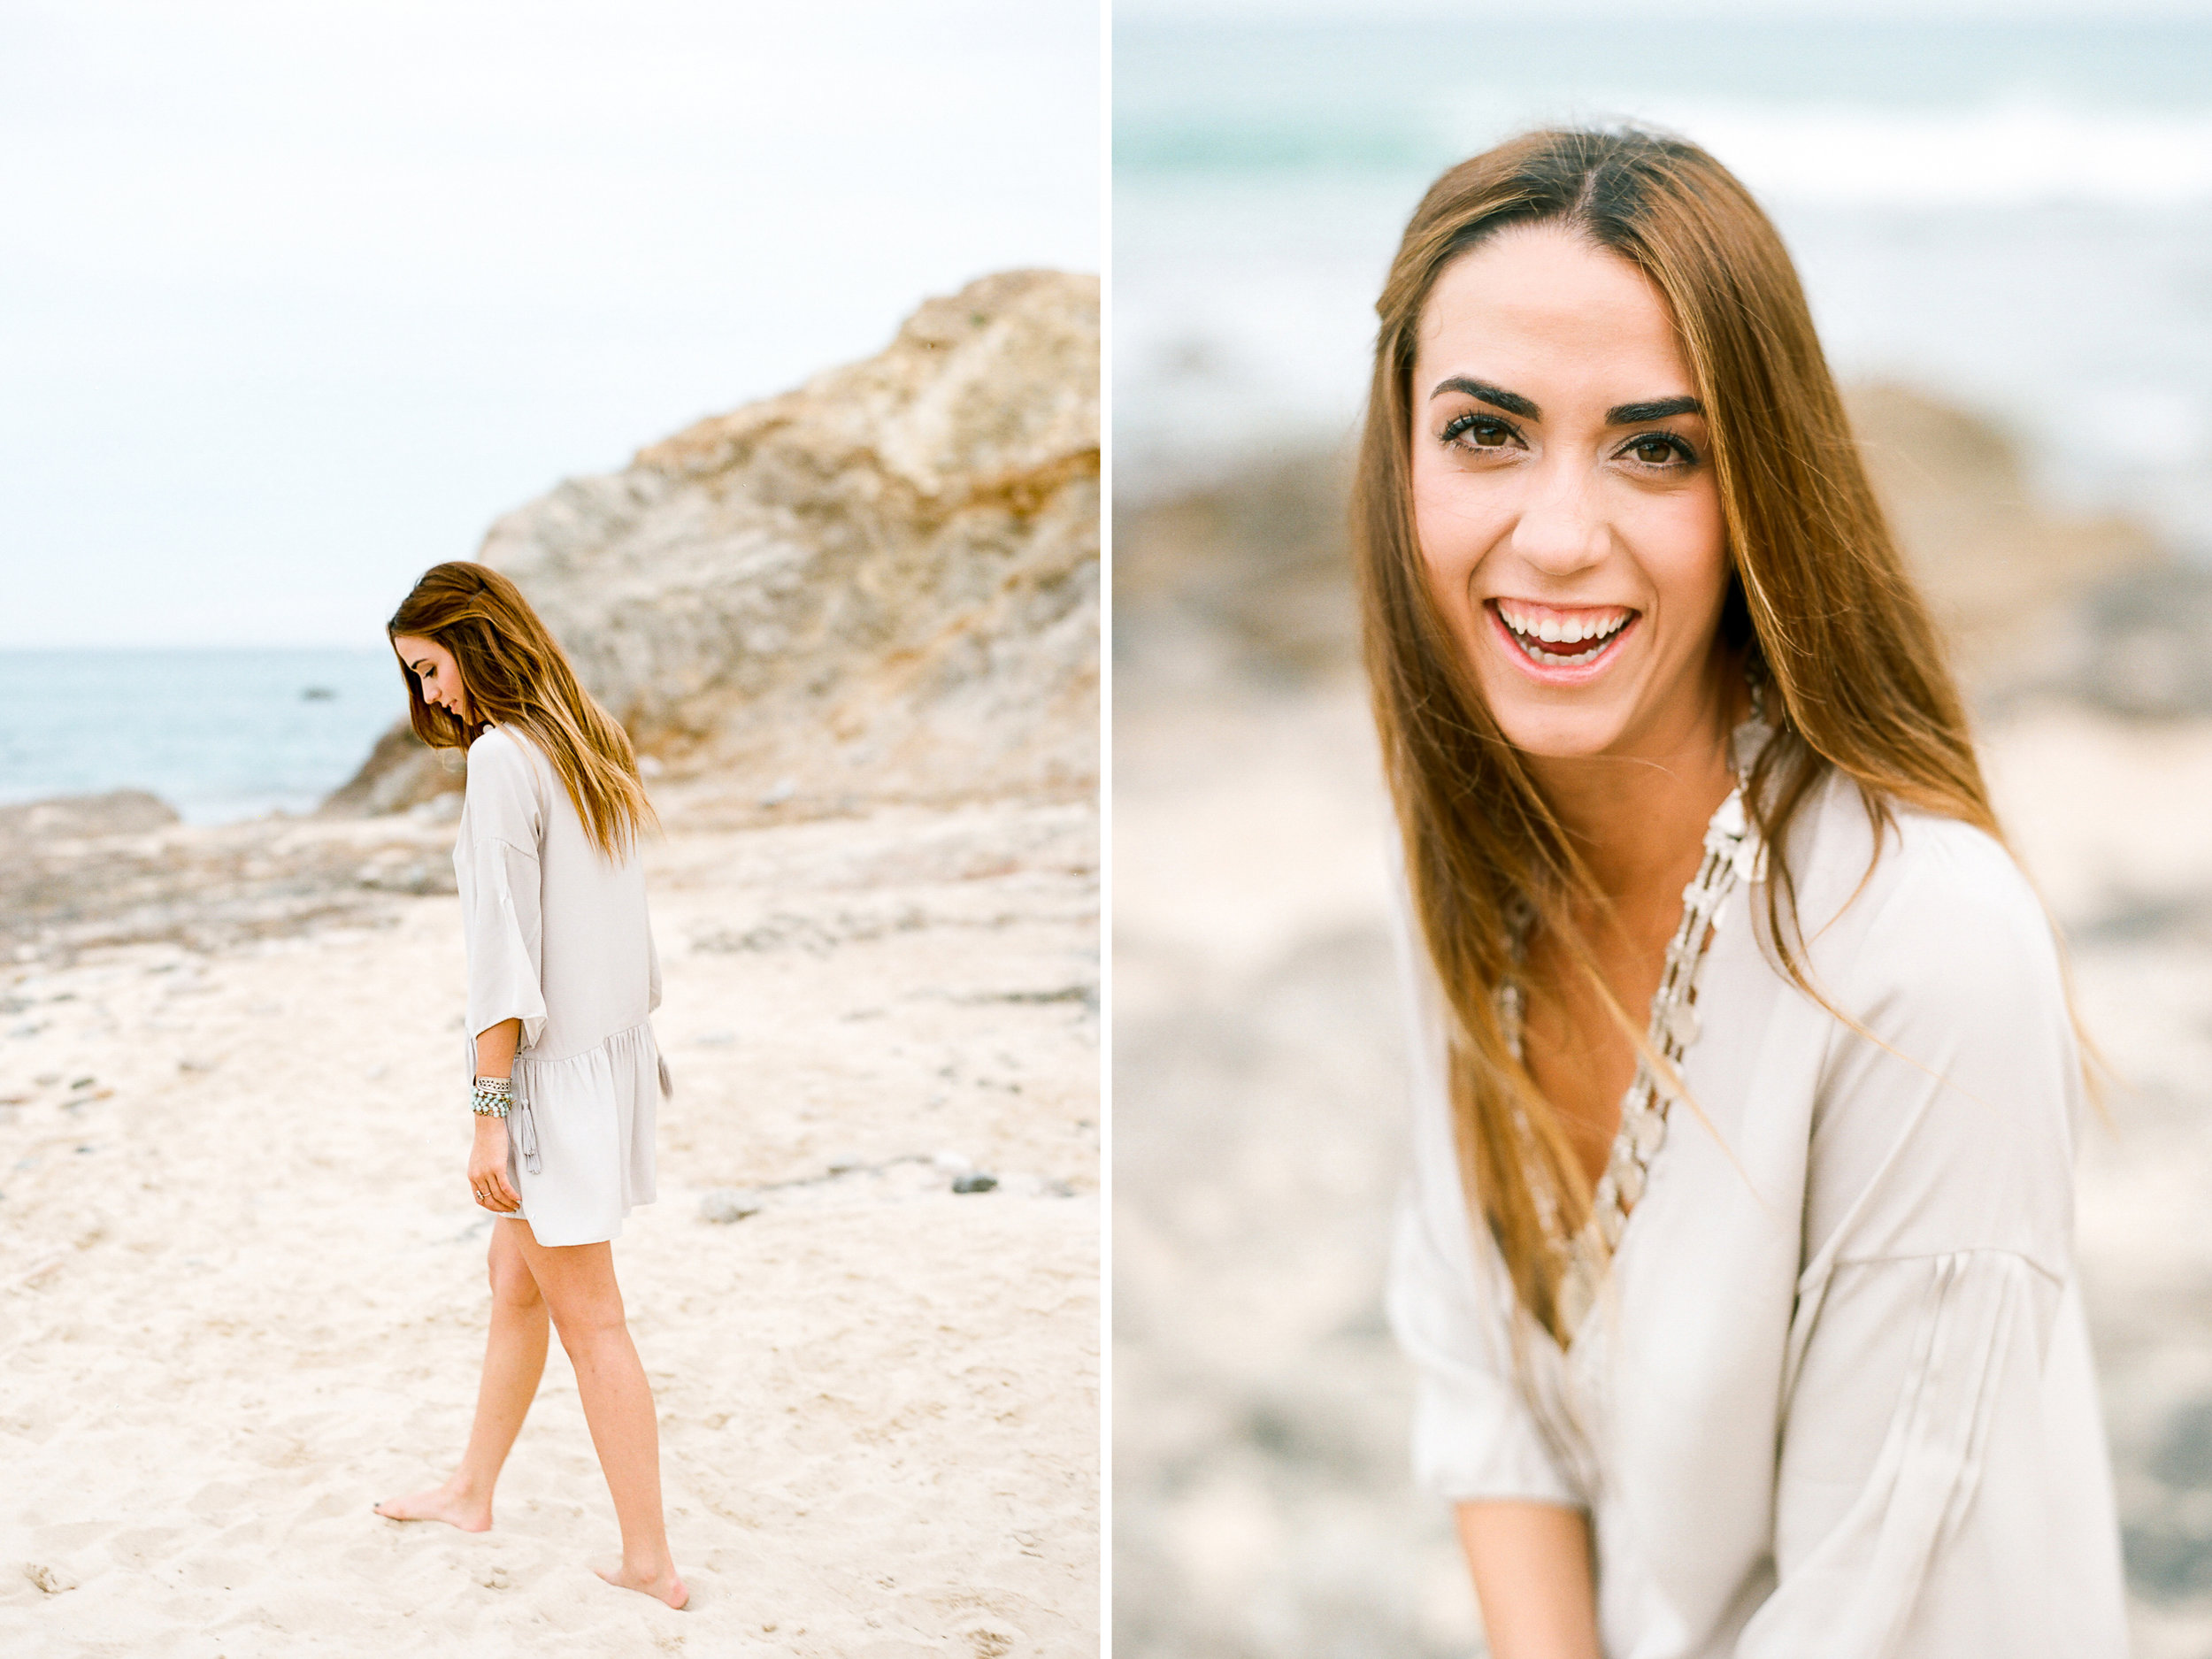 Houston-Senior-Portrait-Photographer-The-Woodlands-Senior-Portrait-Photographer-Dana-Fernandez-Photography-101.jpg